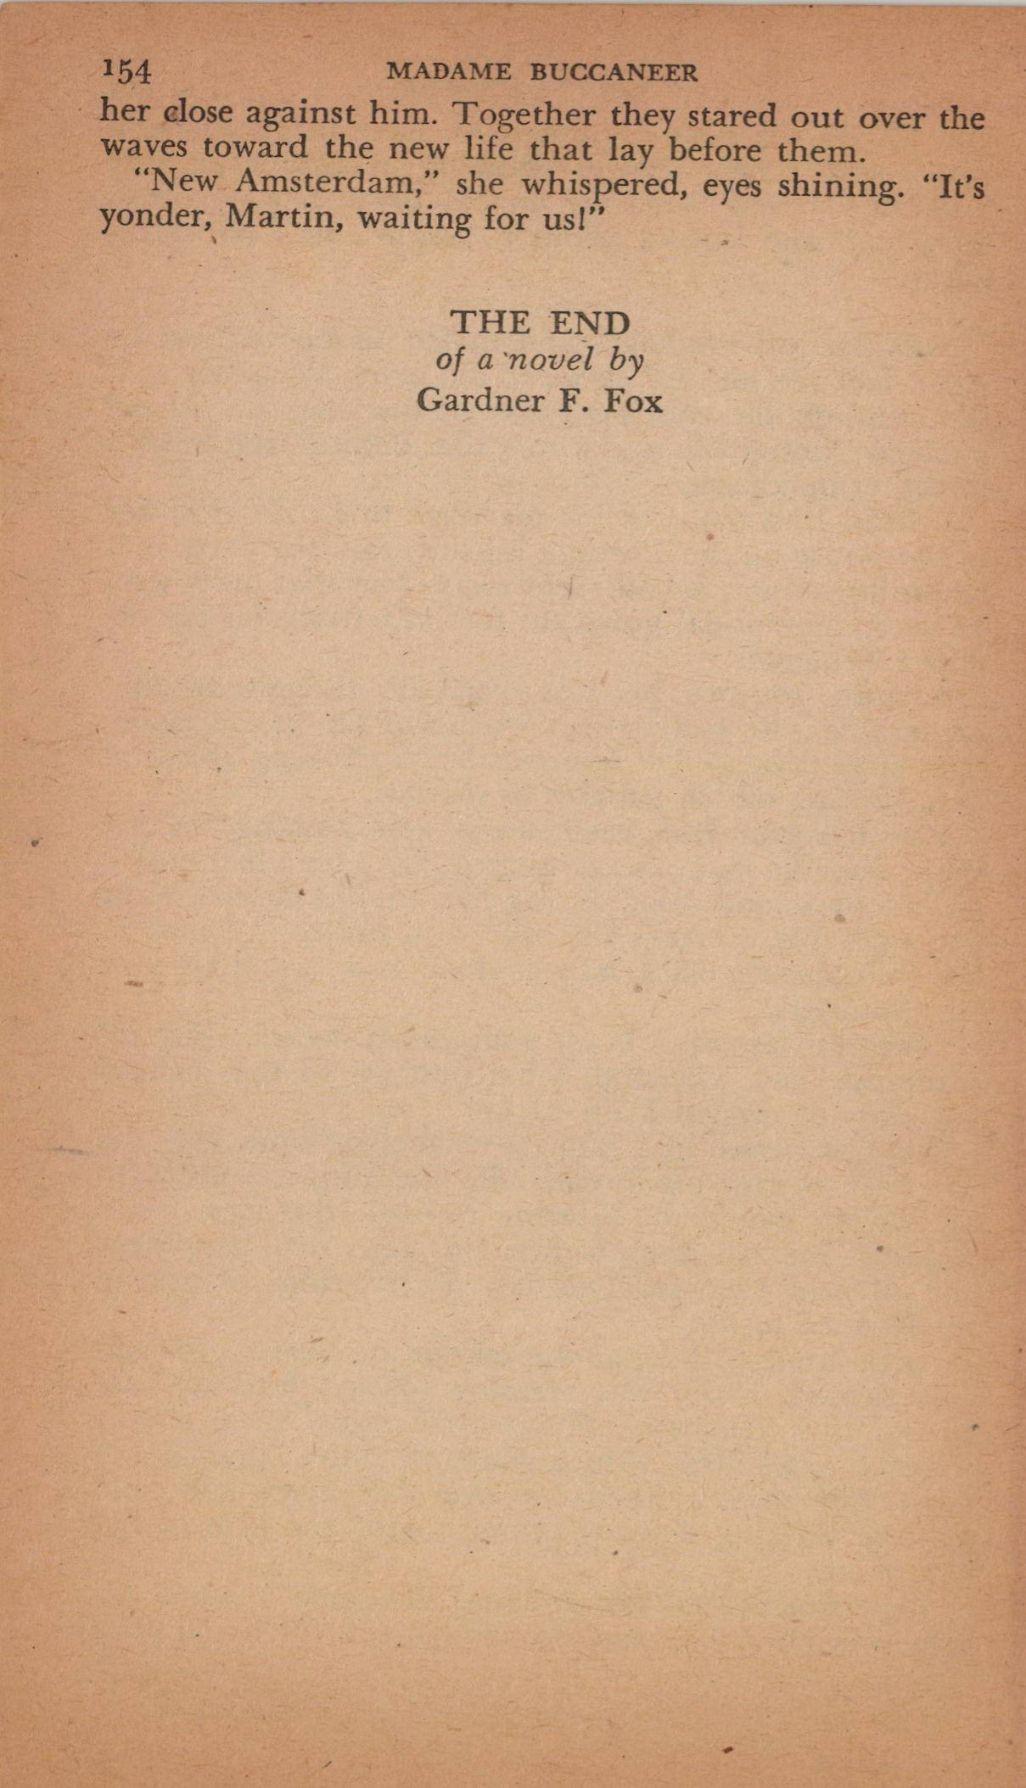 Madame Buccaneer Gardner F Fox 155.jpg